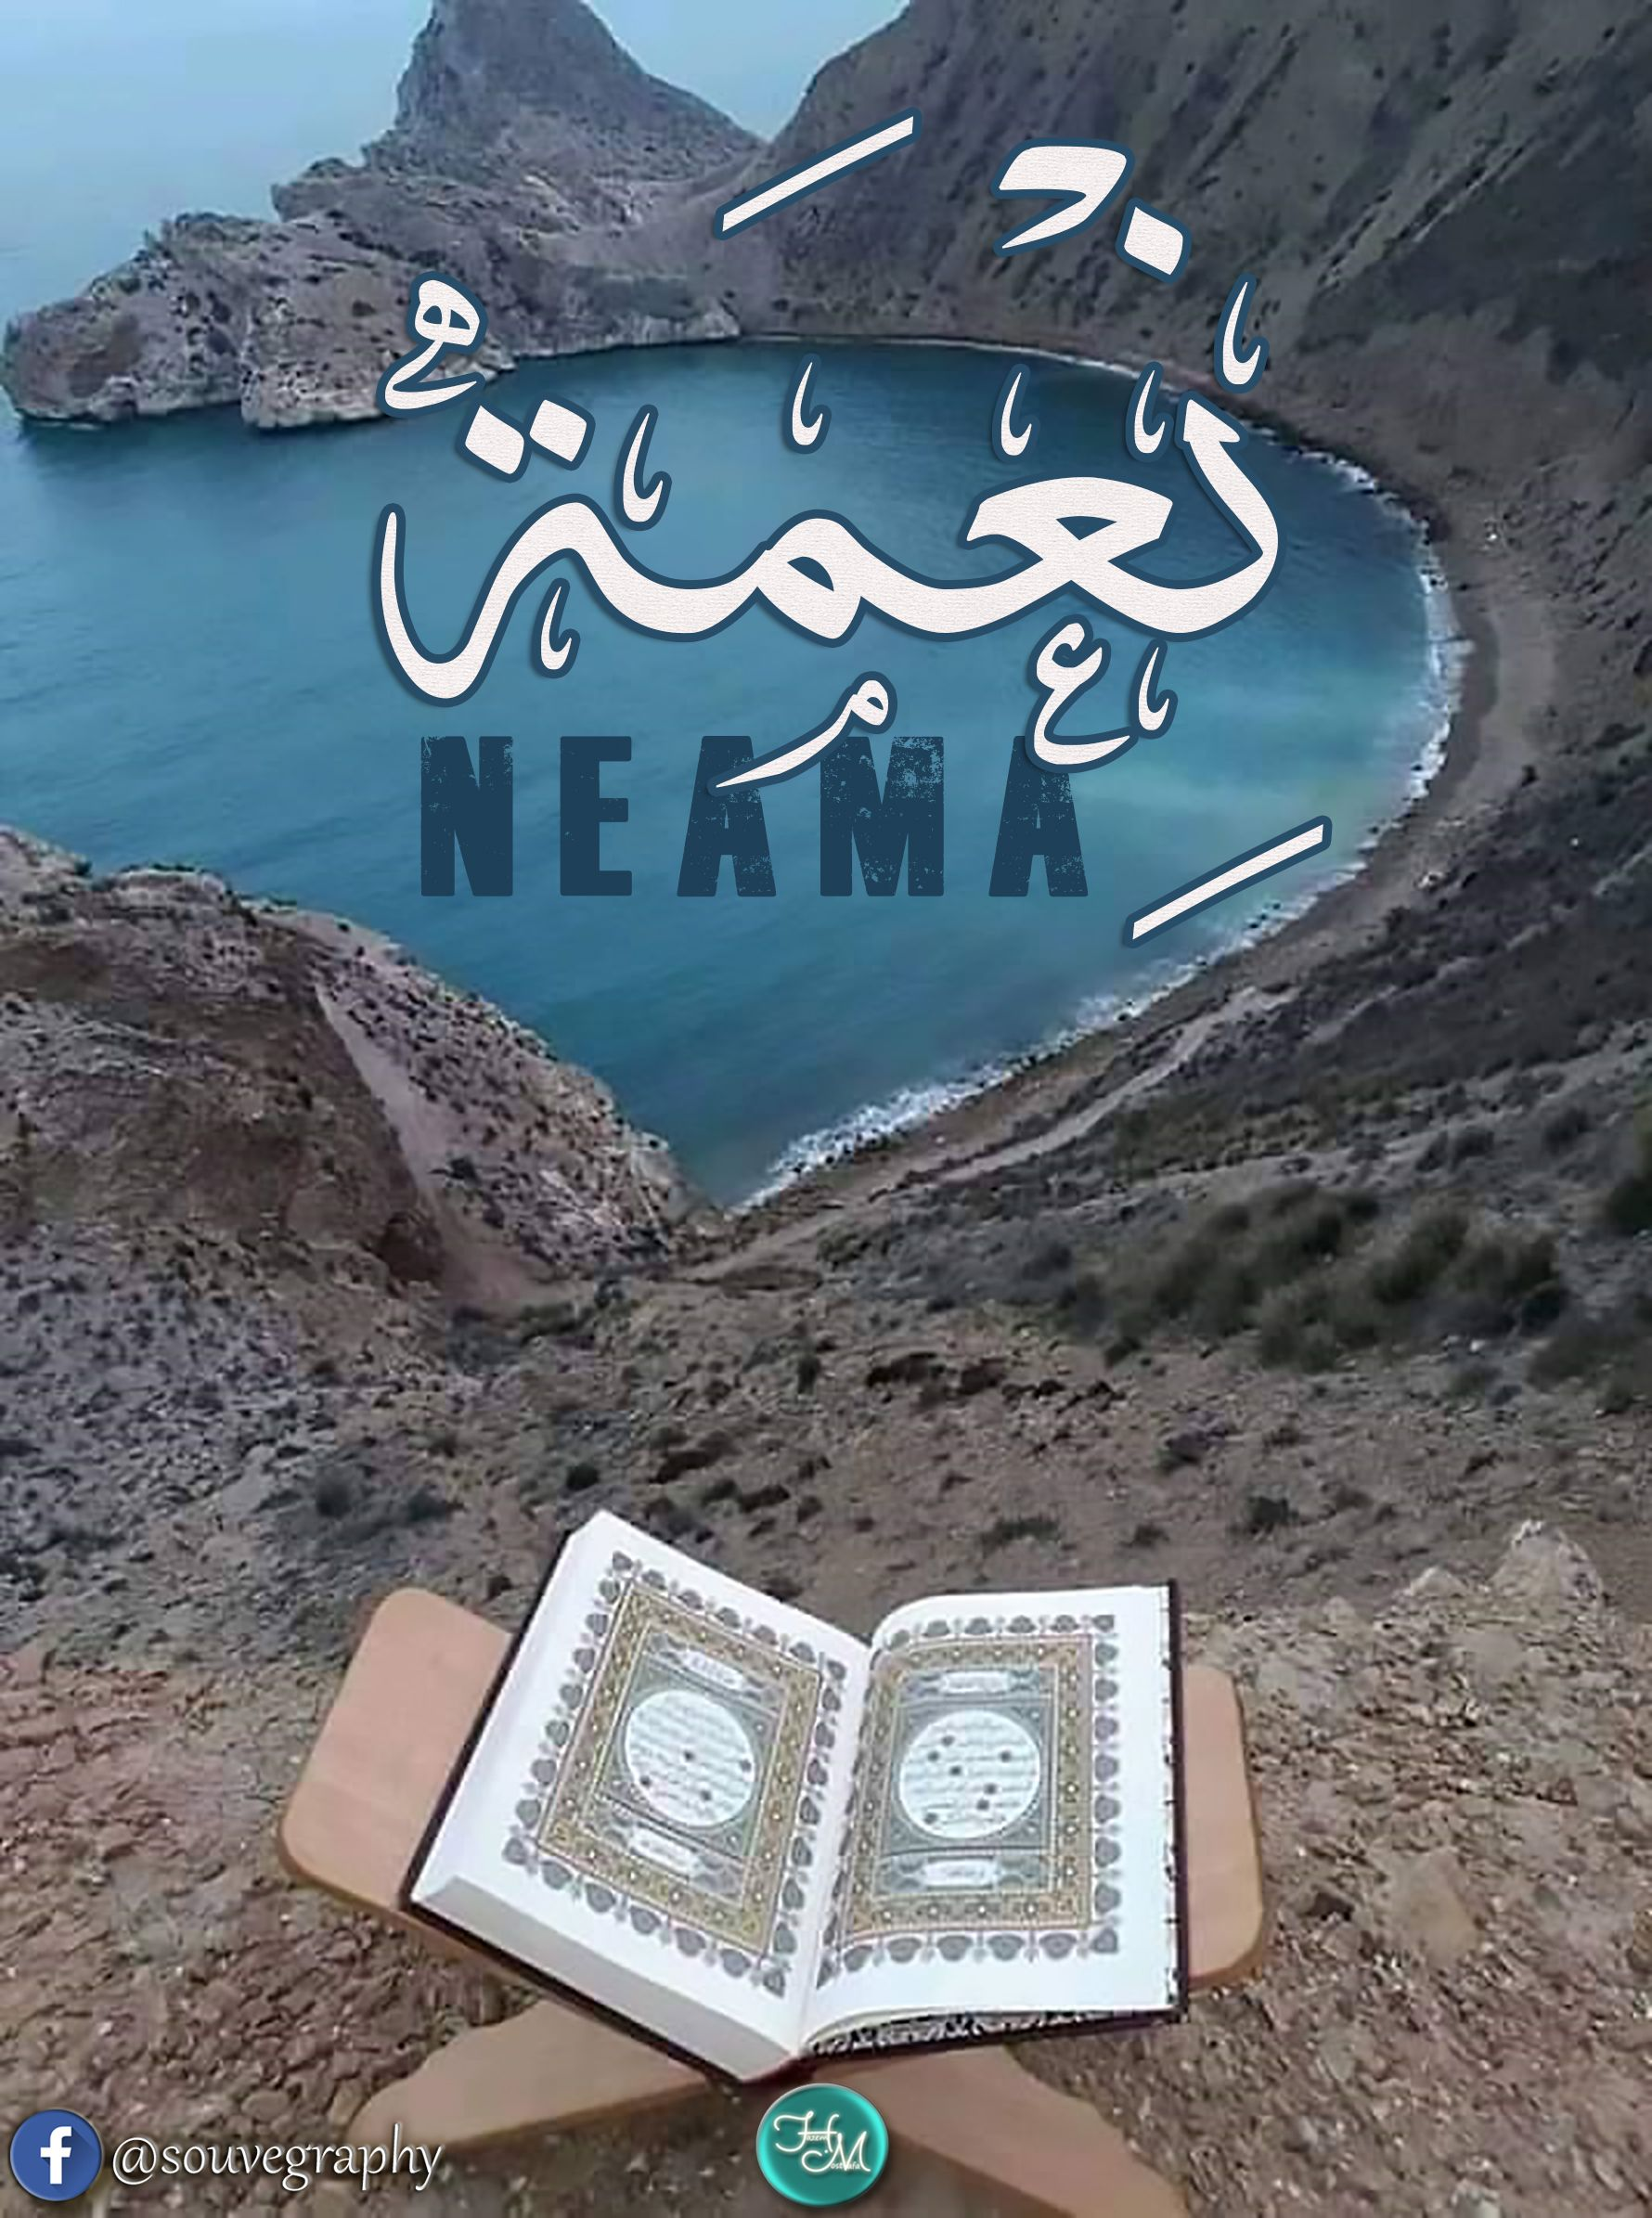 Pin By Asib Raza On Logo Calligraphy Name Art Prints Quotes Islamic Calligraphy Painting